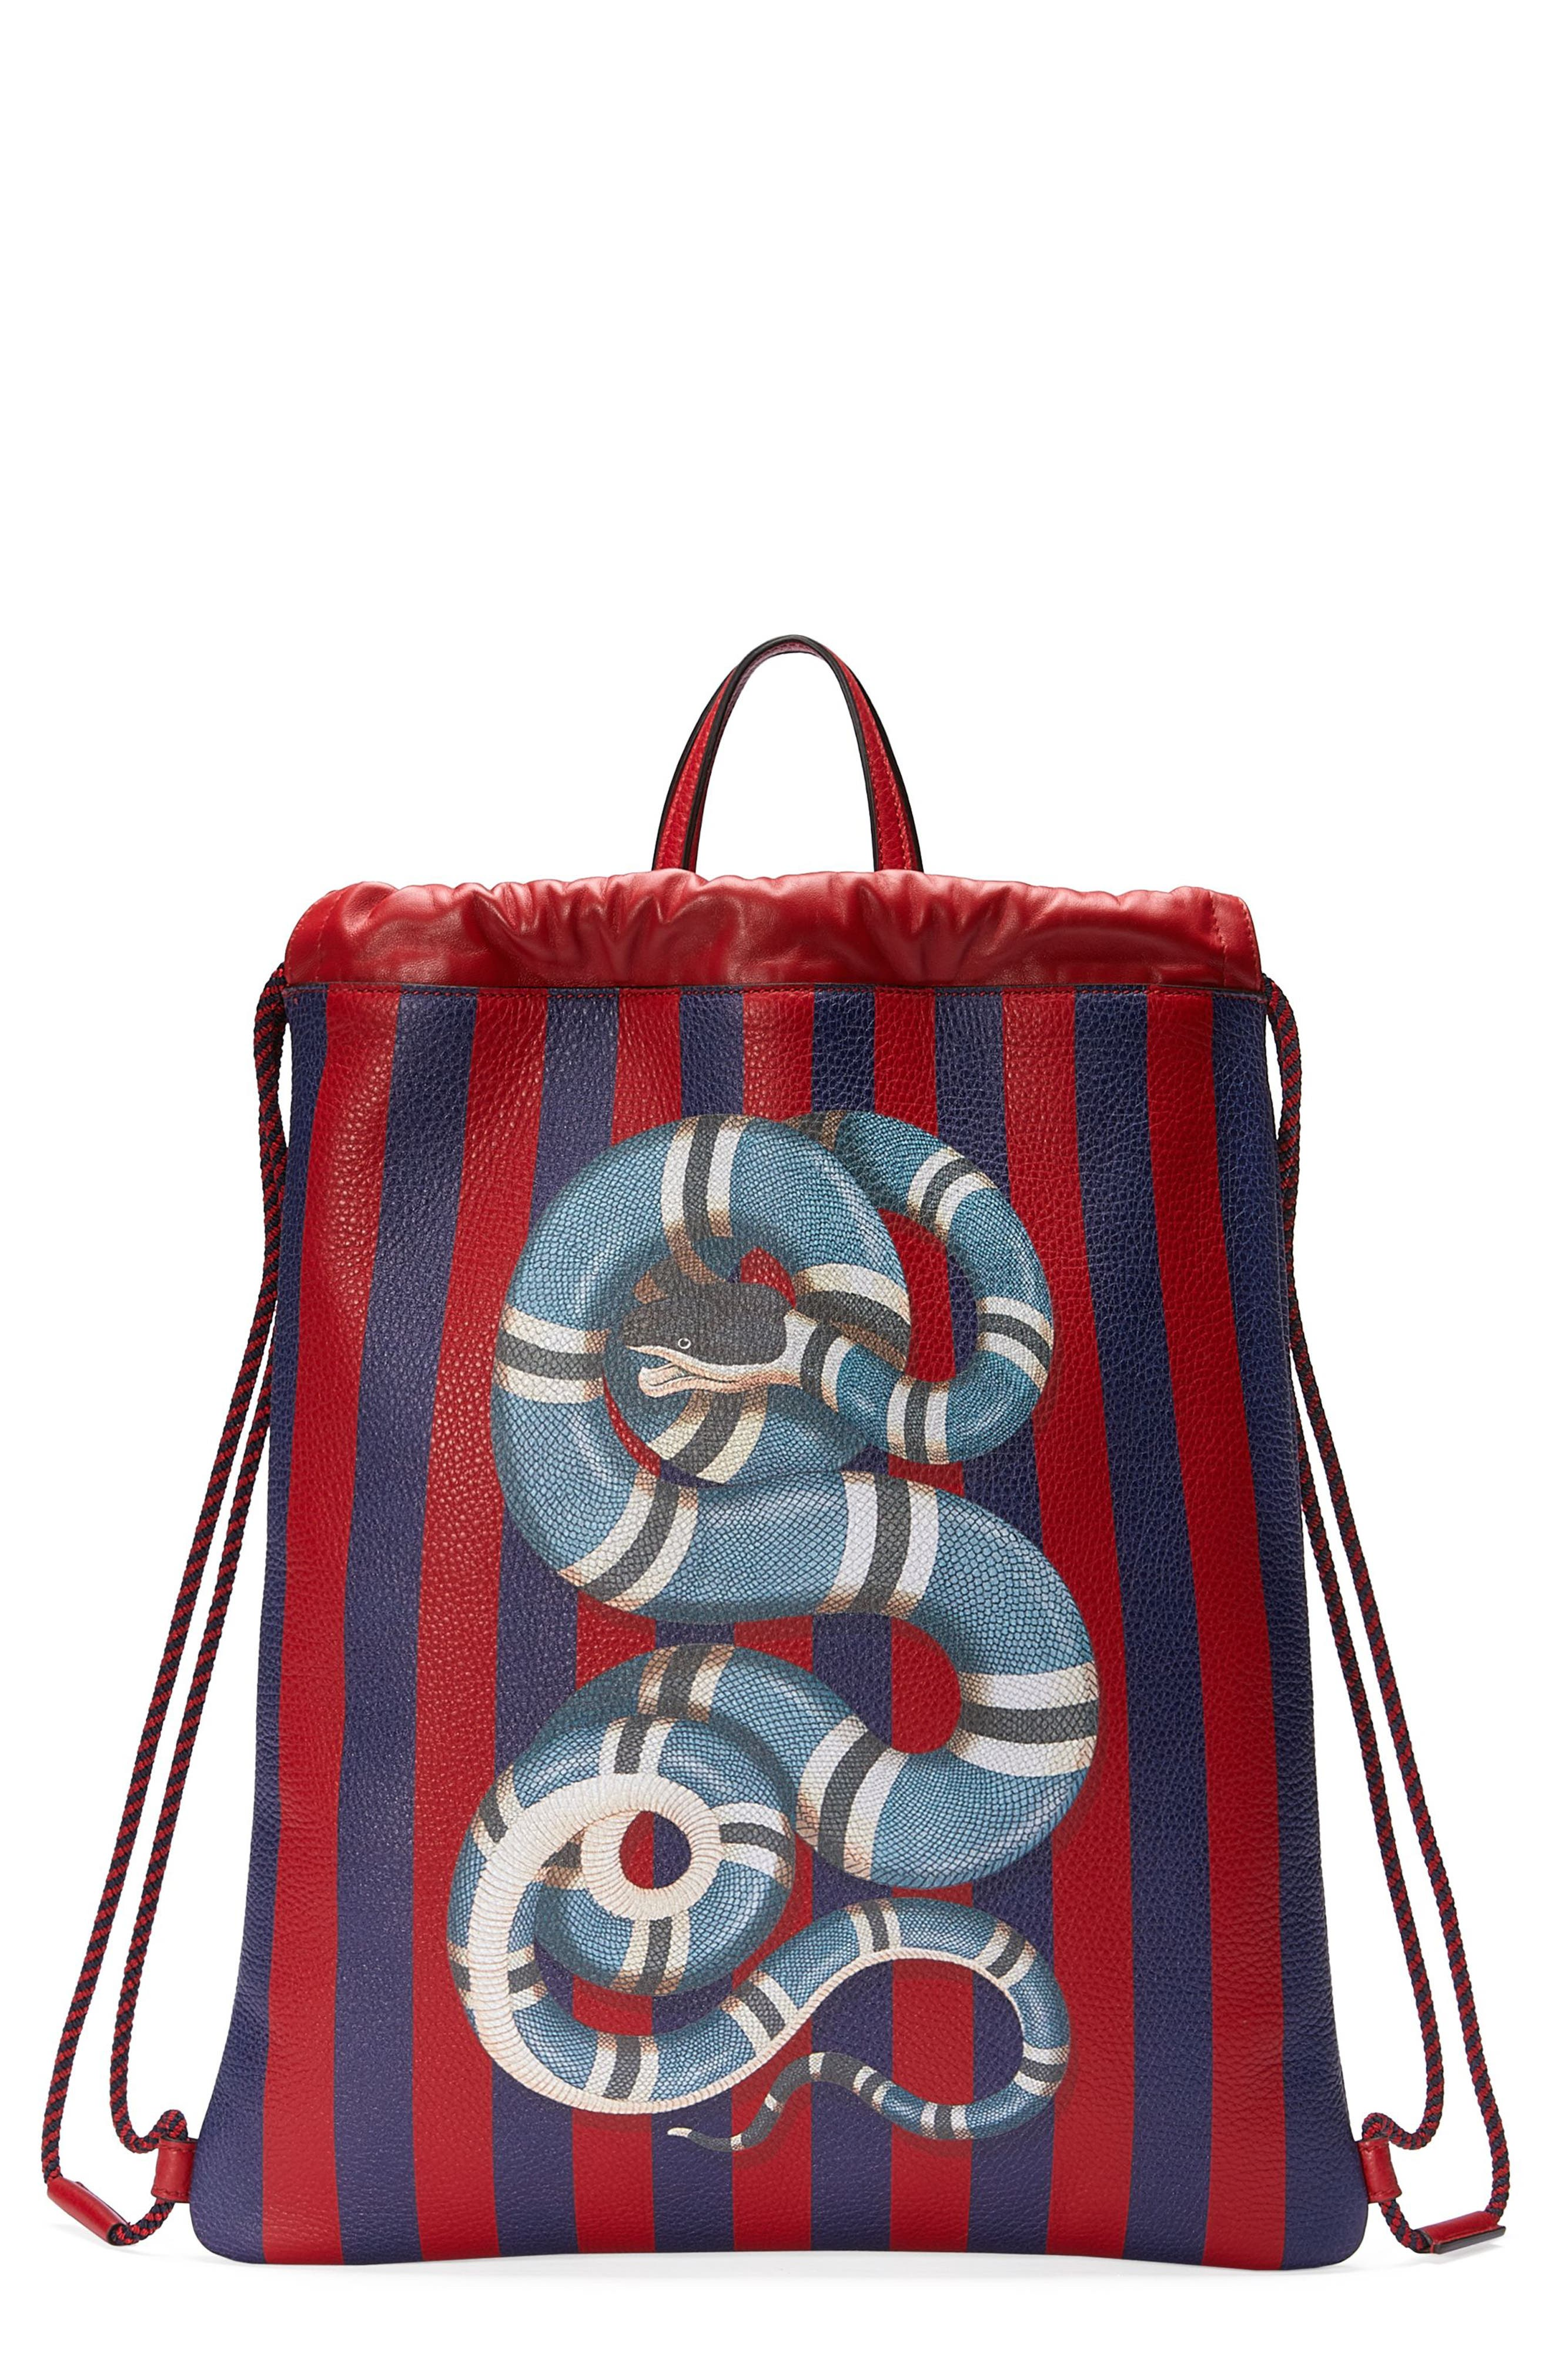 Alternate Image 1 Selected - Gucci Kingsnake Stripe Leather Drawstring Backpack